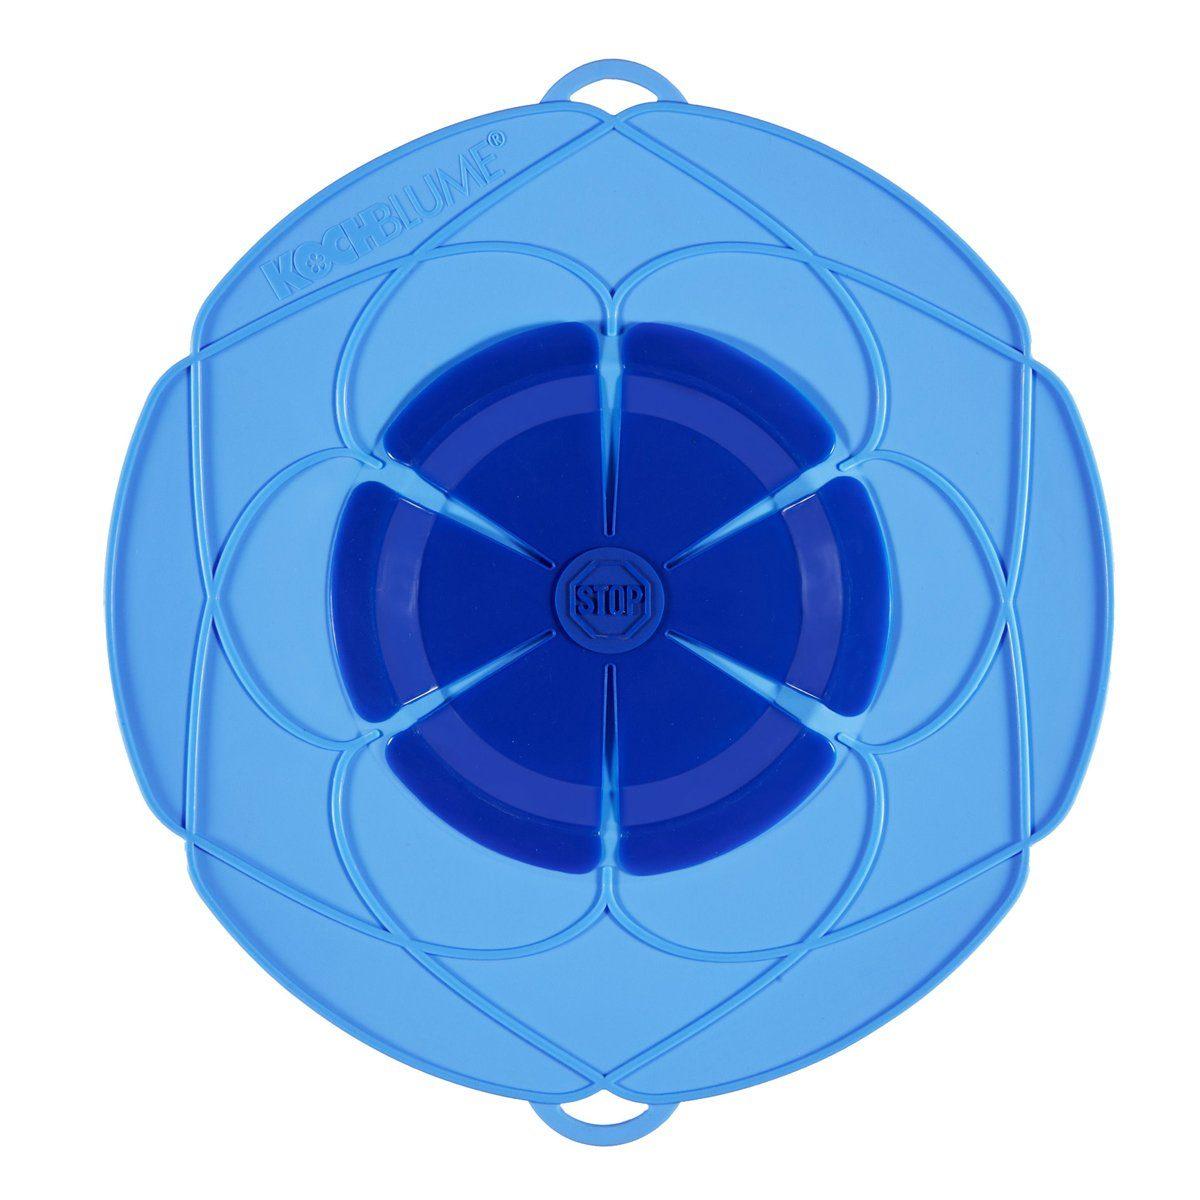 Kochblume Kochblume Überkochschutz blau 33 cm